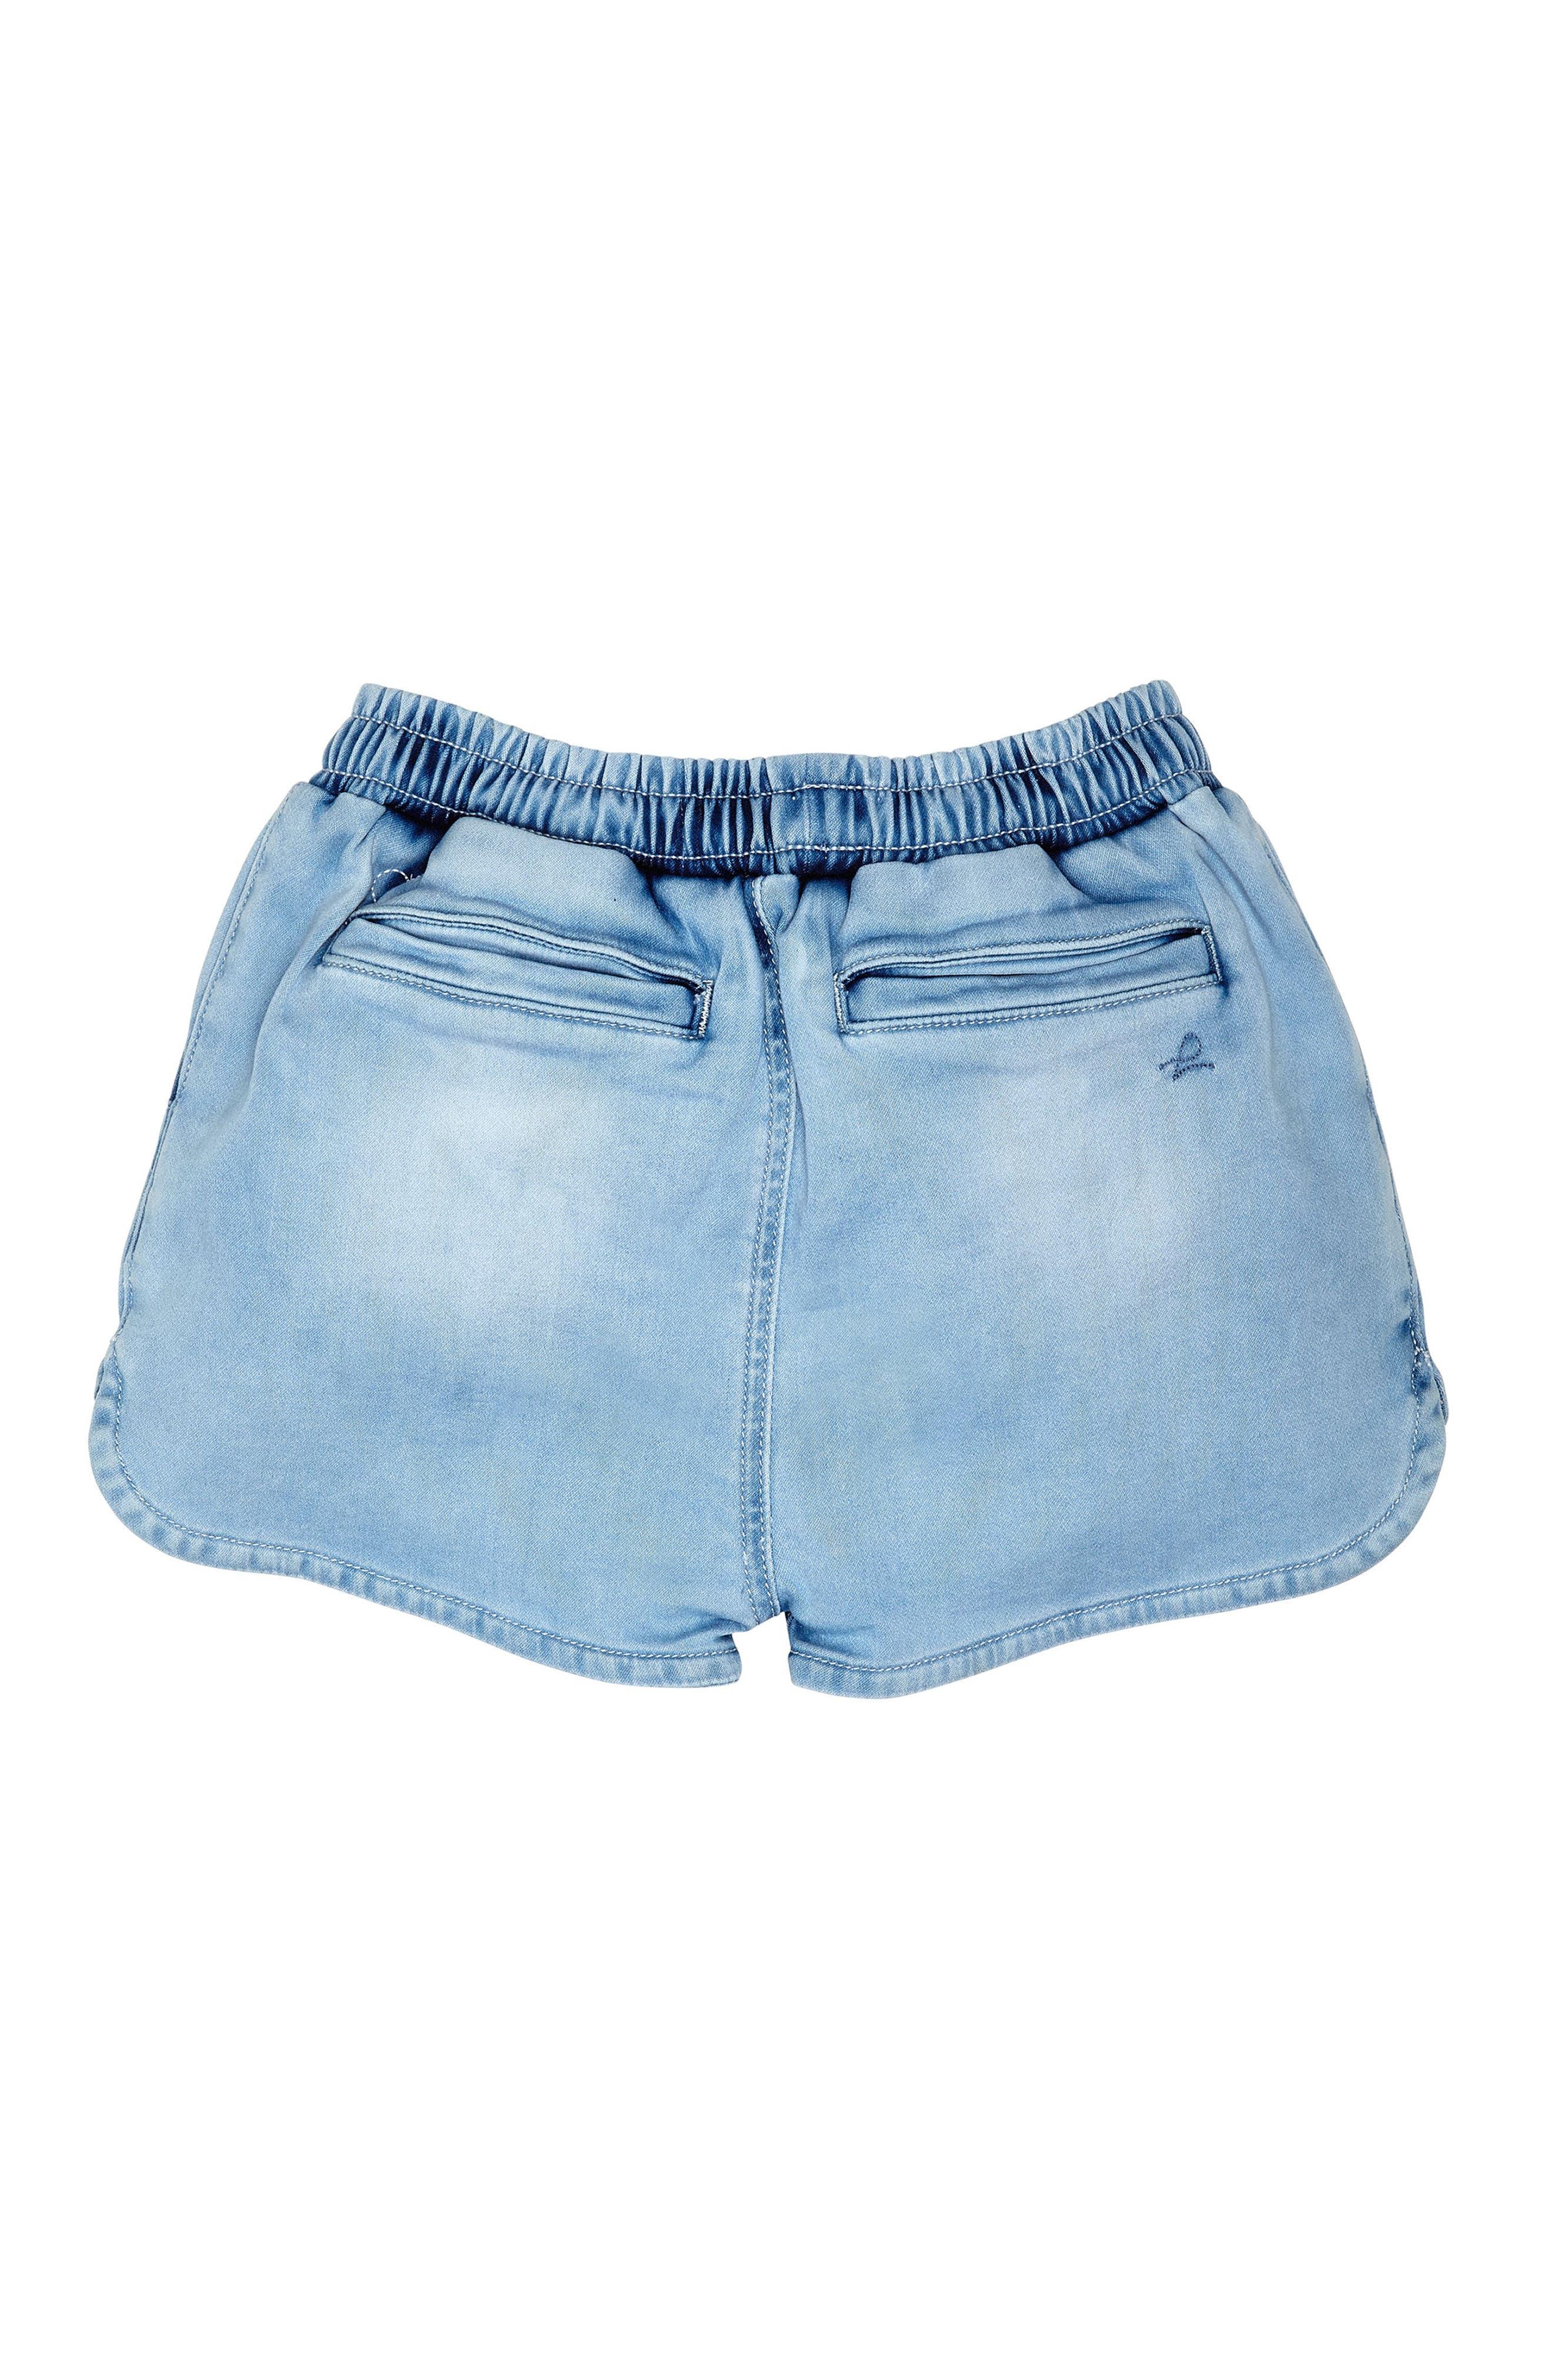 Denim Sport Shorts,                             Alternate thumbnail 2, color,